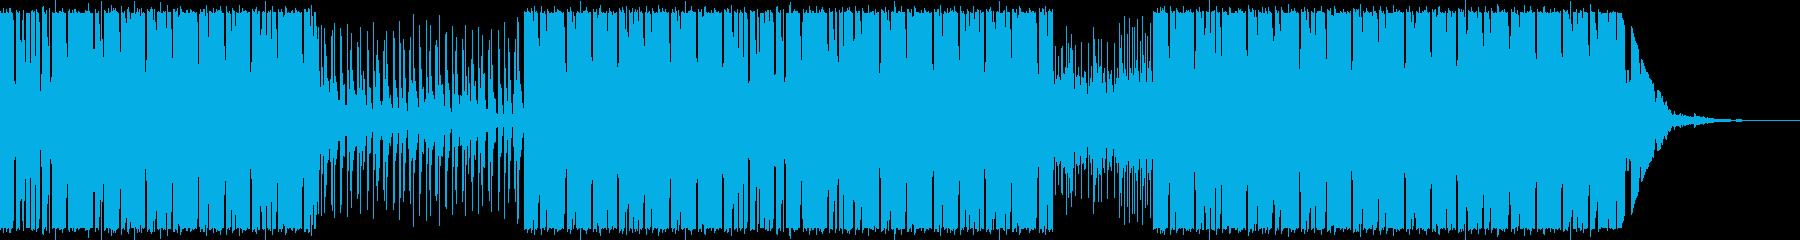 Electro Rock の01の再生済みの波形